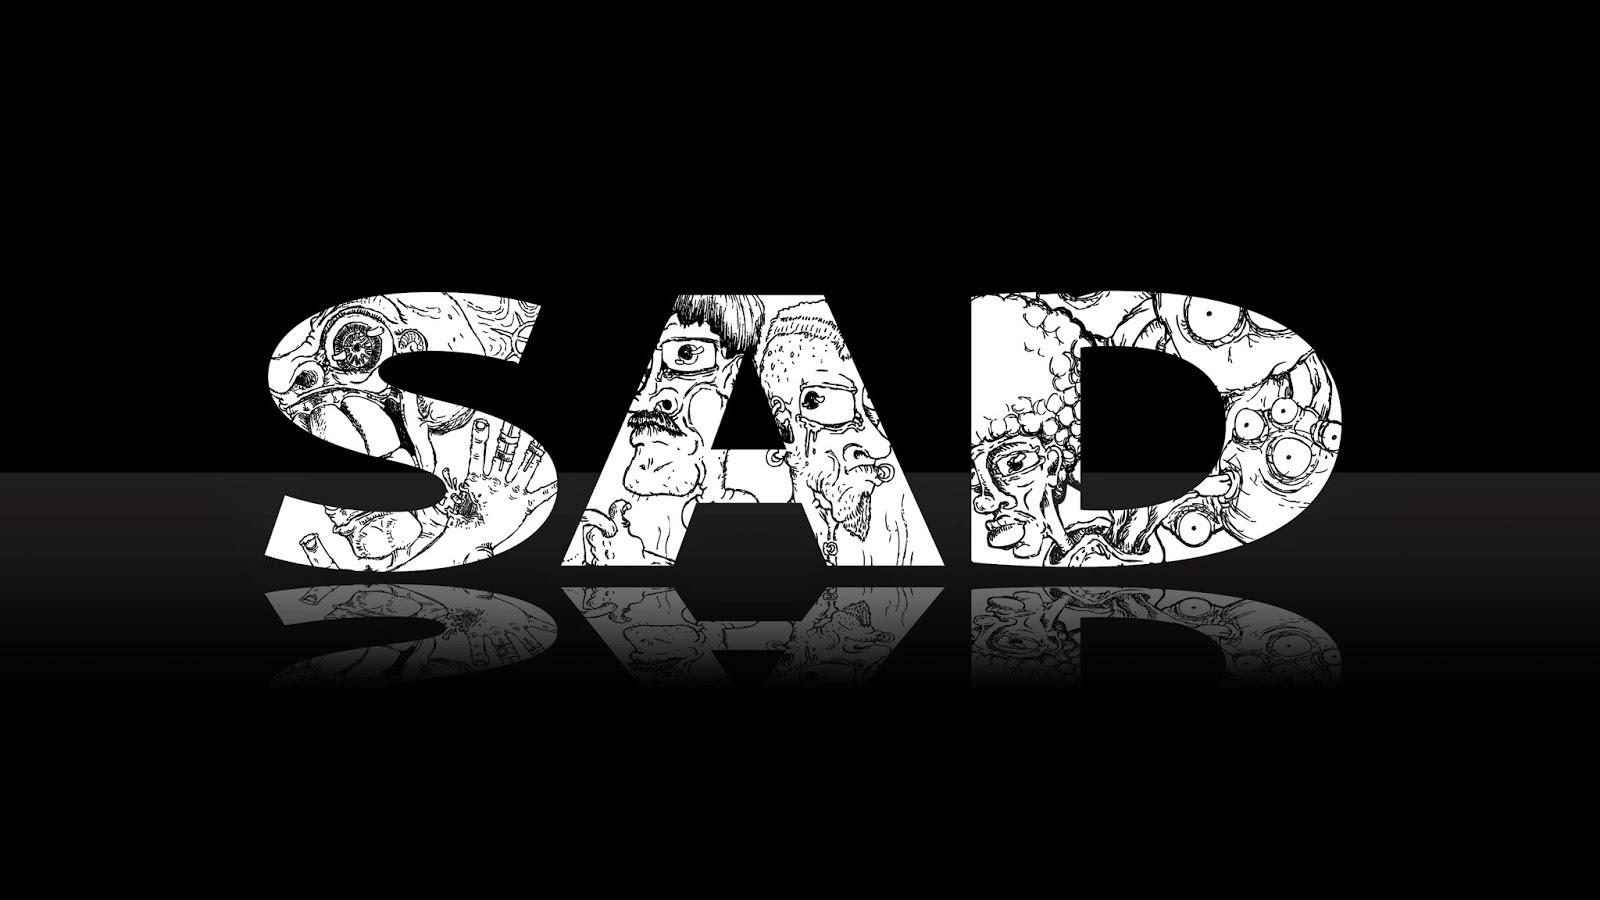 Sad Wallpaper | Chilly Studio: Sad Wallpaper Sad